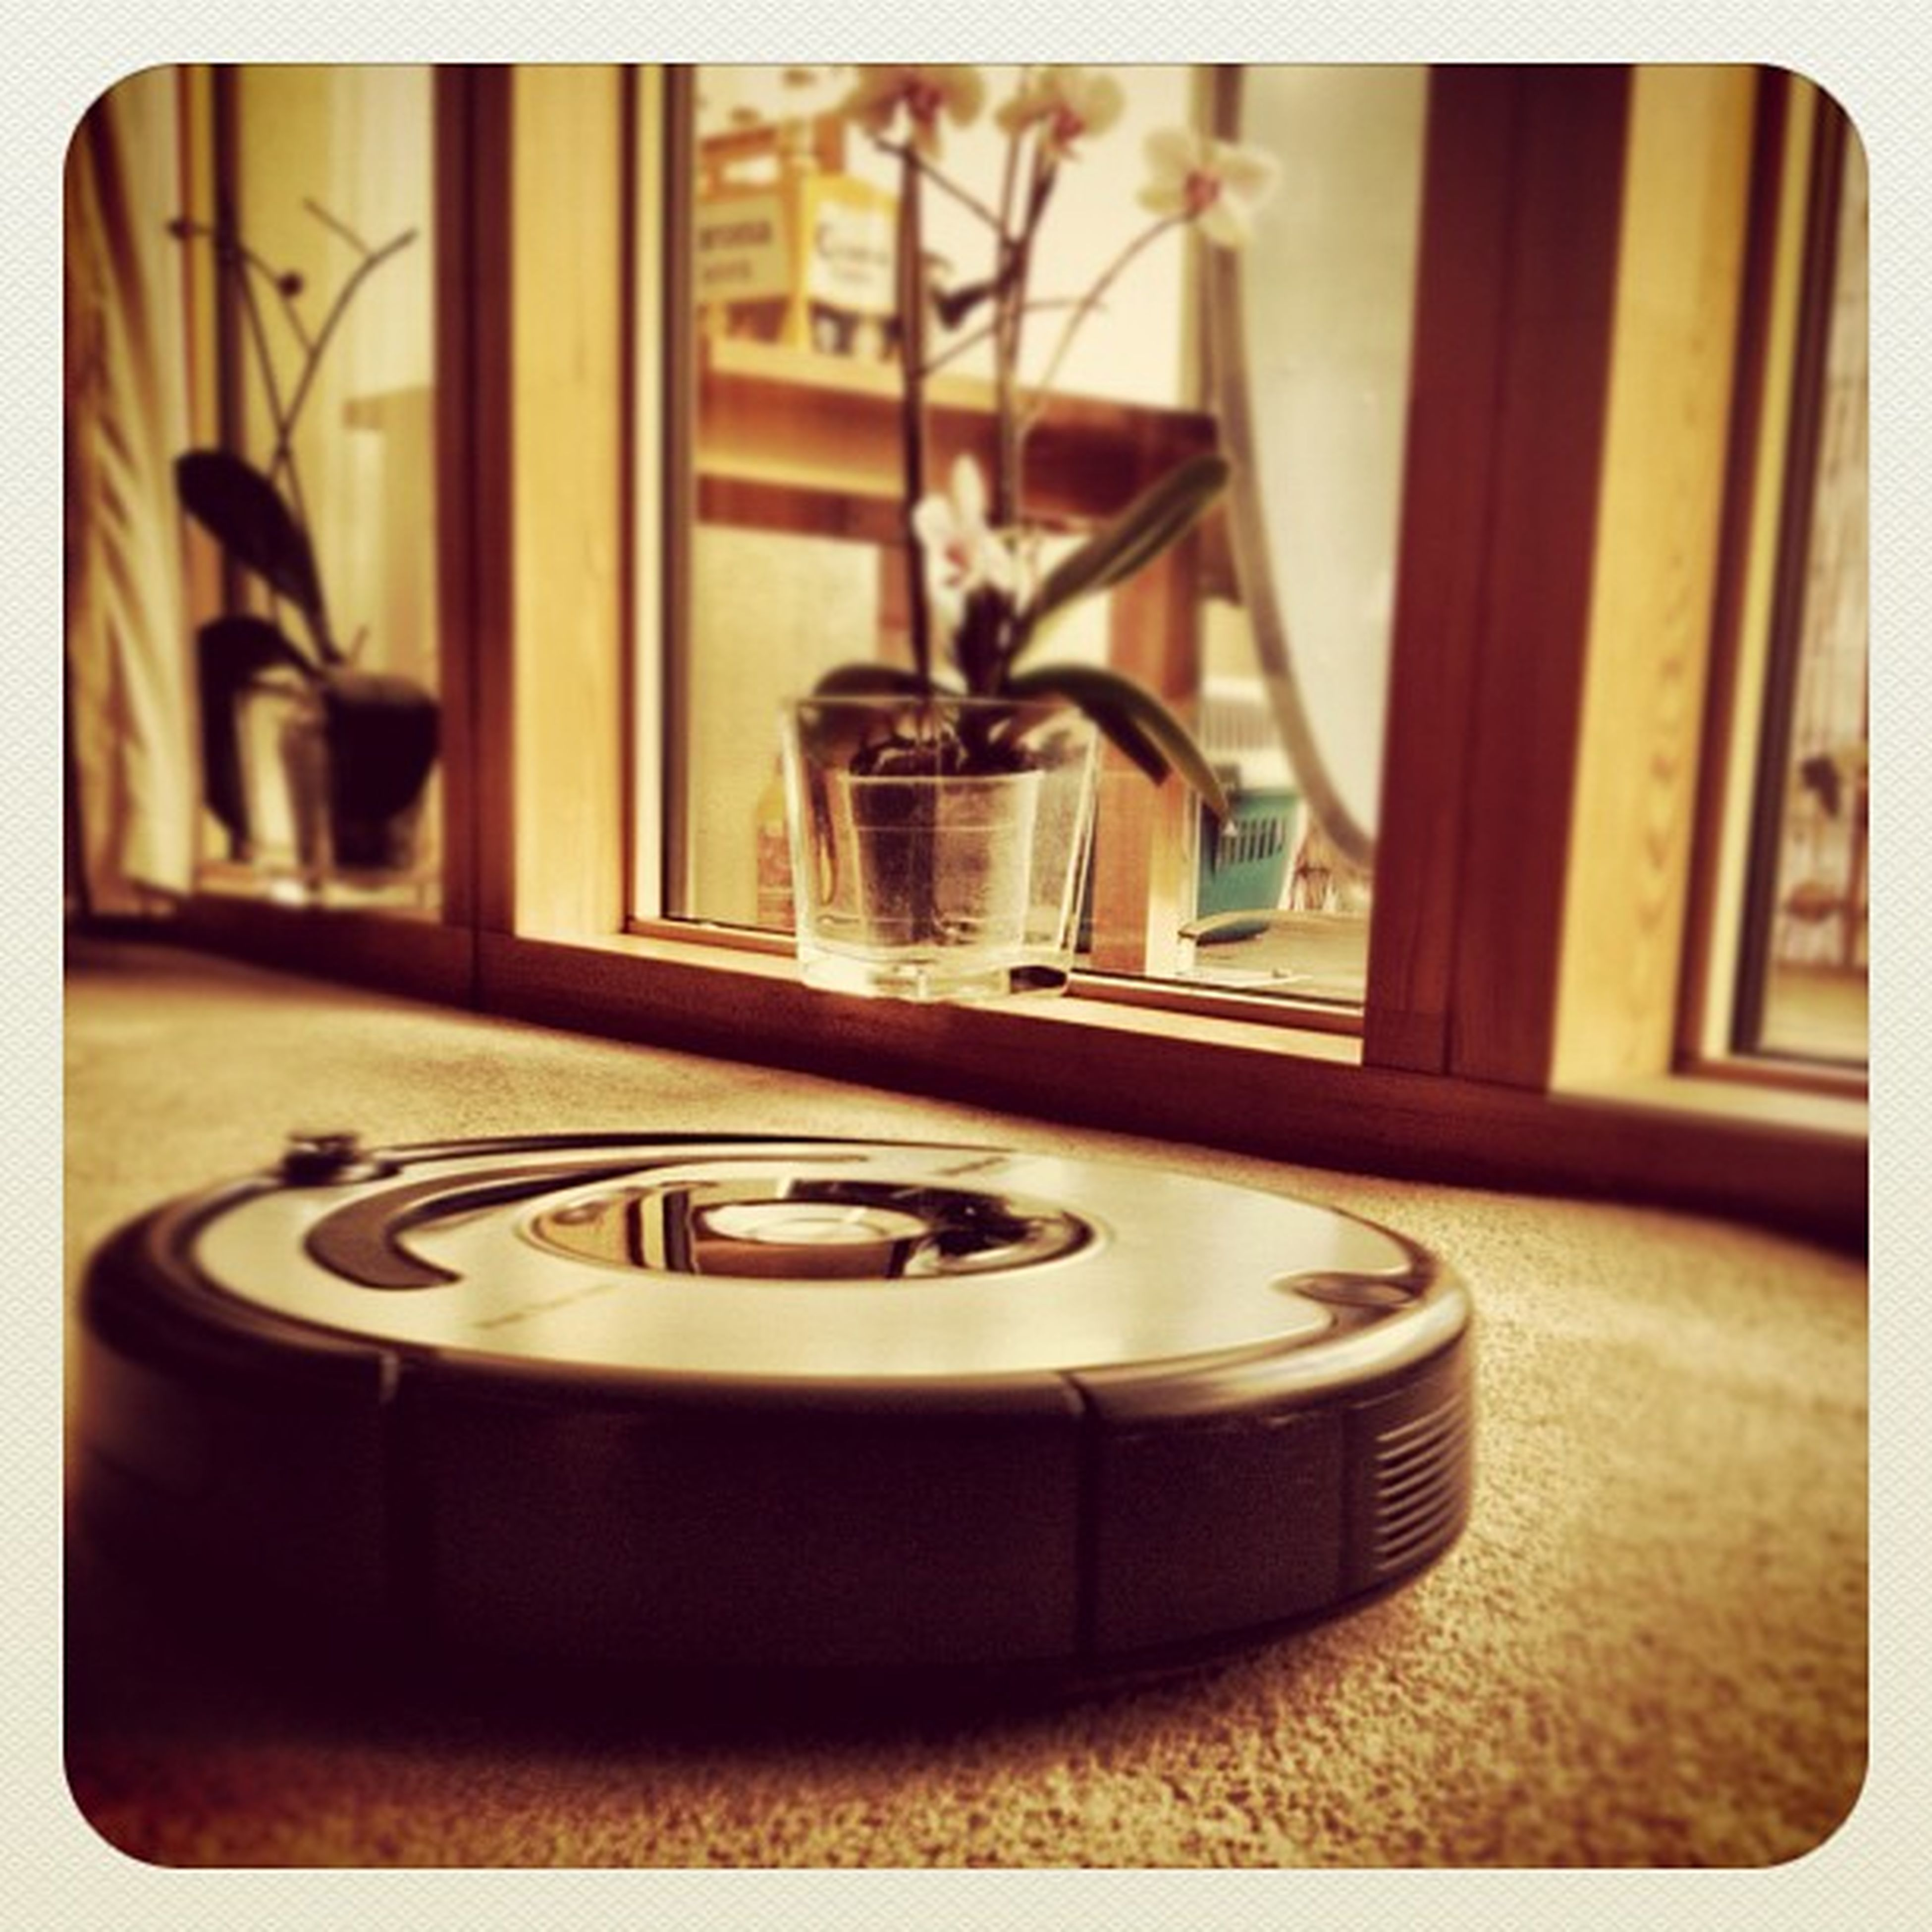 Morning Jammin' ? iRobot #roomba #hoover #ireland #earlybirdlove #gf_ire #ebstyles_gf #jj_forum #jj Ireland Hoover Jj  Earlybirdlove Jj_forum Ebstyles_gf Gf_ire Roomba